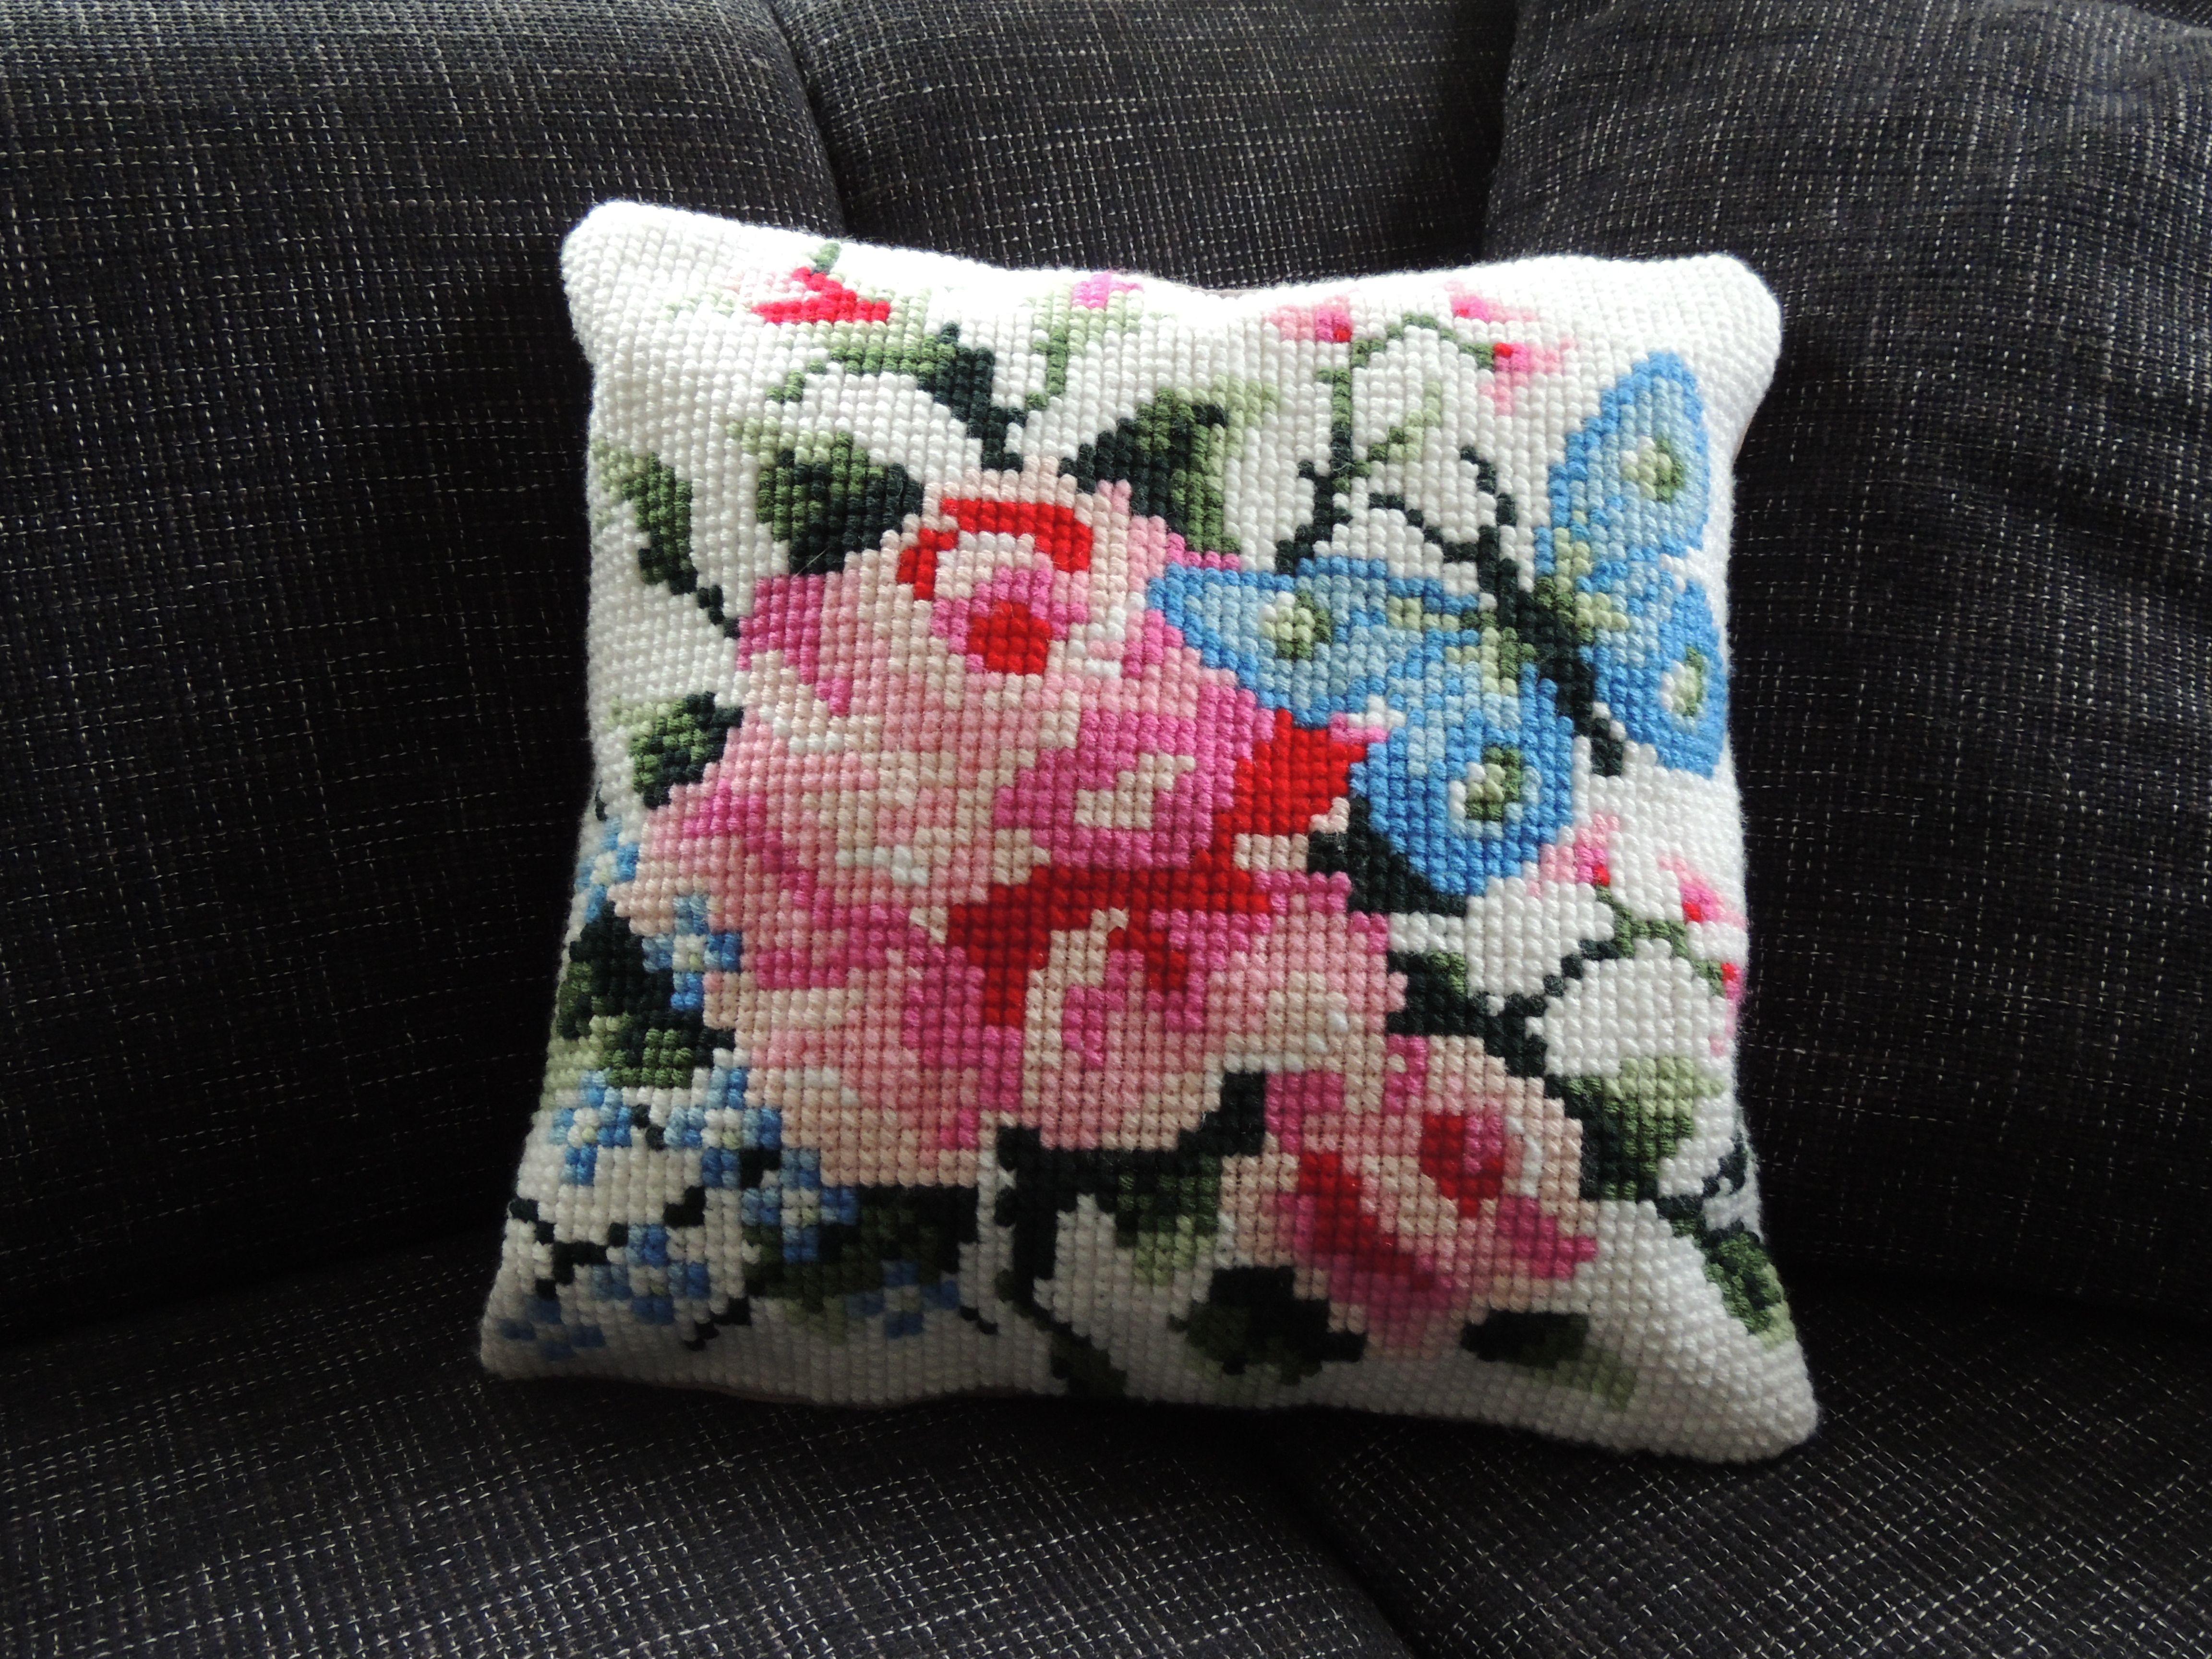 Cross-stitch pillow Eline's Huis